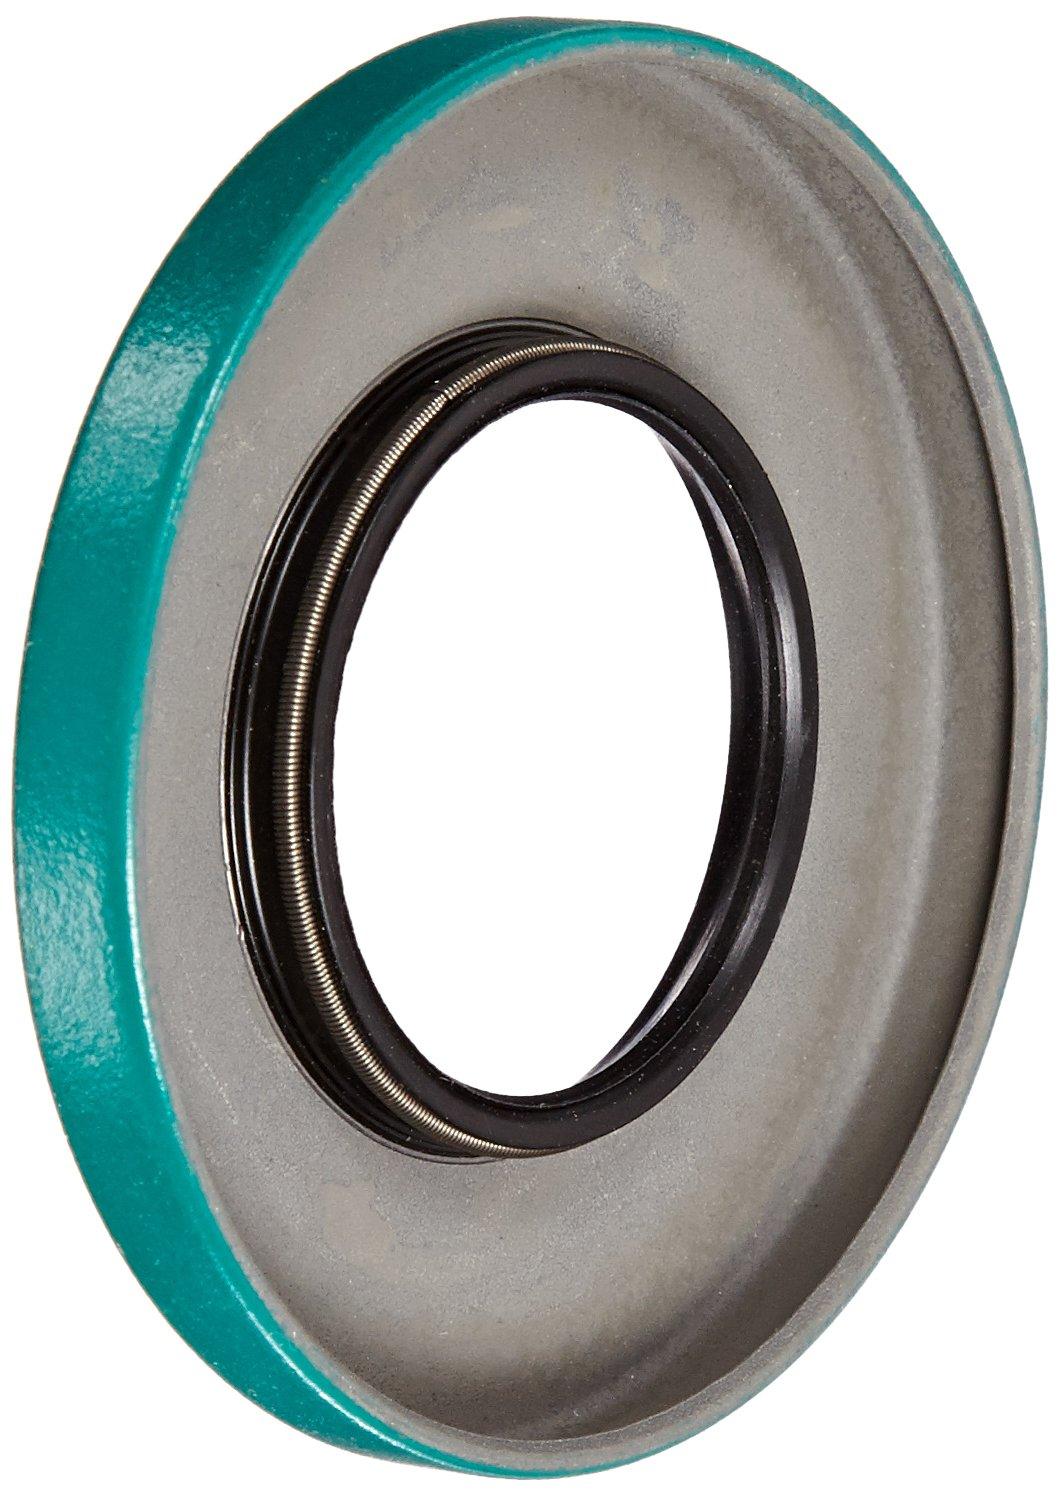 0.313 Width SKF 13900 LDS /& Small Bore Seal R Lip Code Inch 2.716 Bore Diameter 1.375 Shaft Diameter CRW1 Style